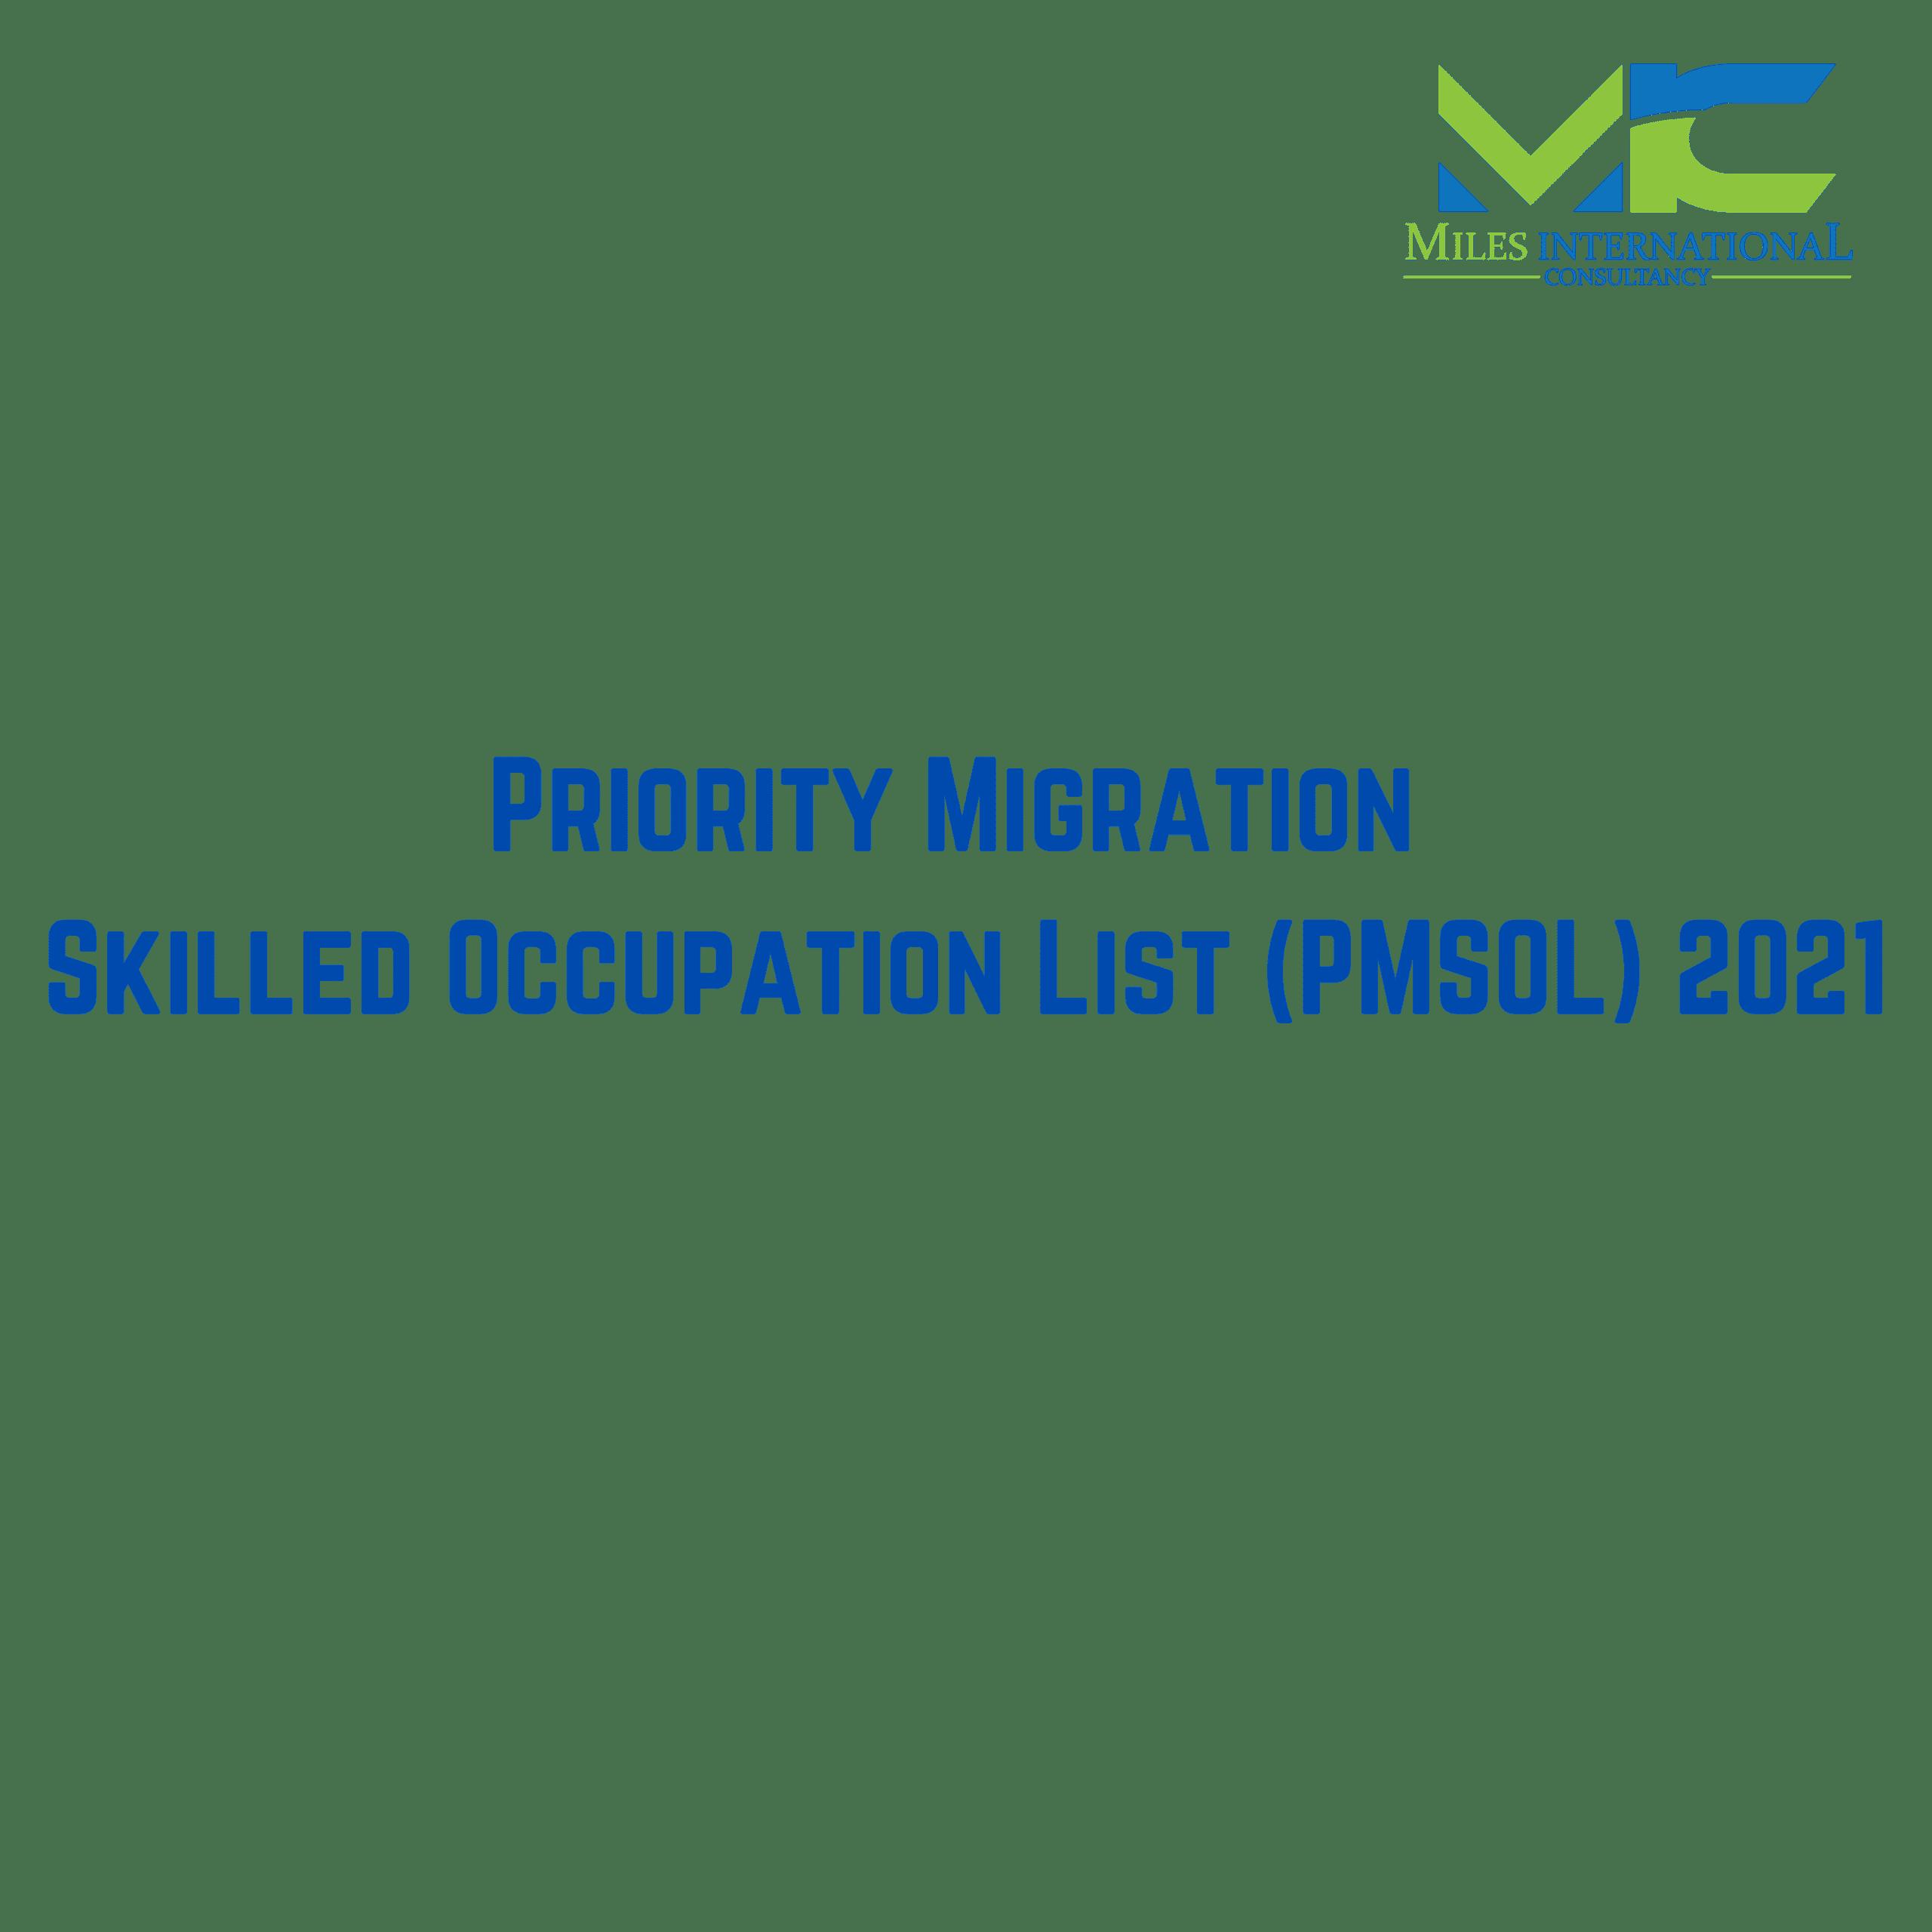 Priority Migration Skilled Occupation List (PMSOL) 2021